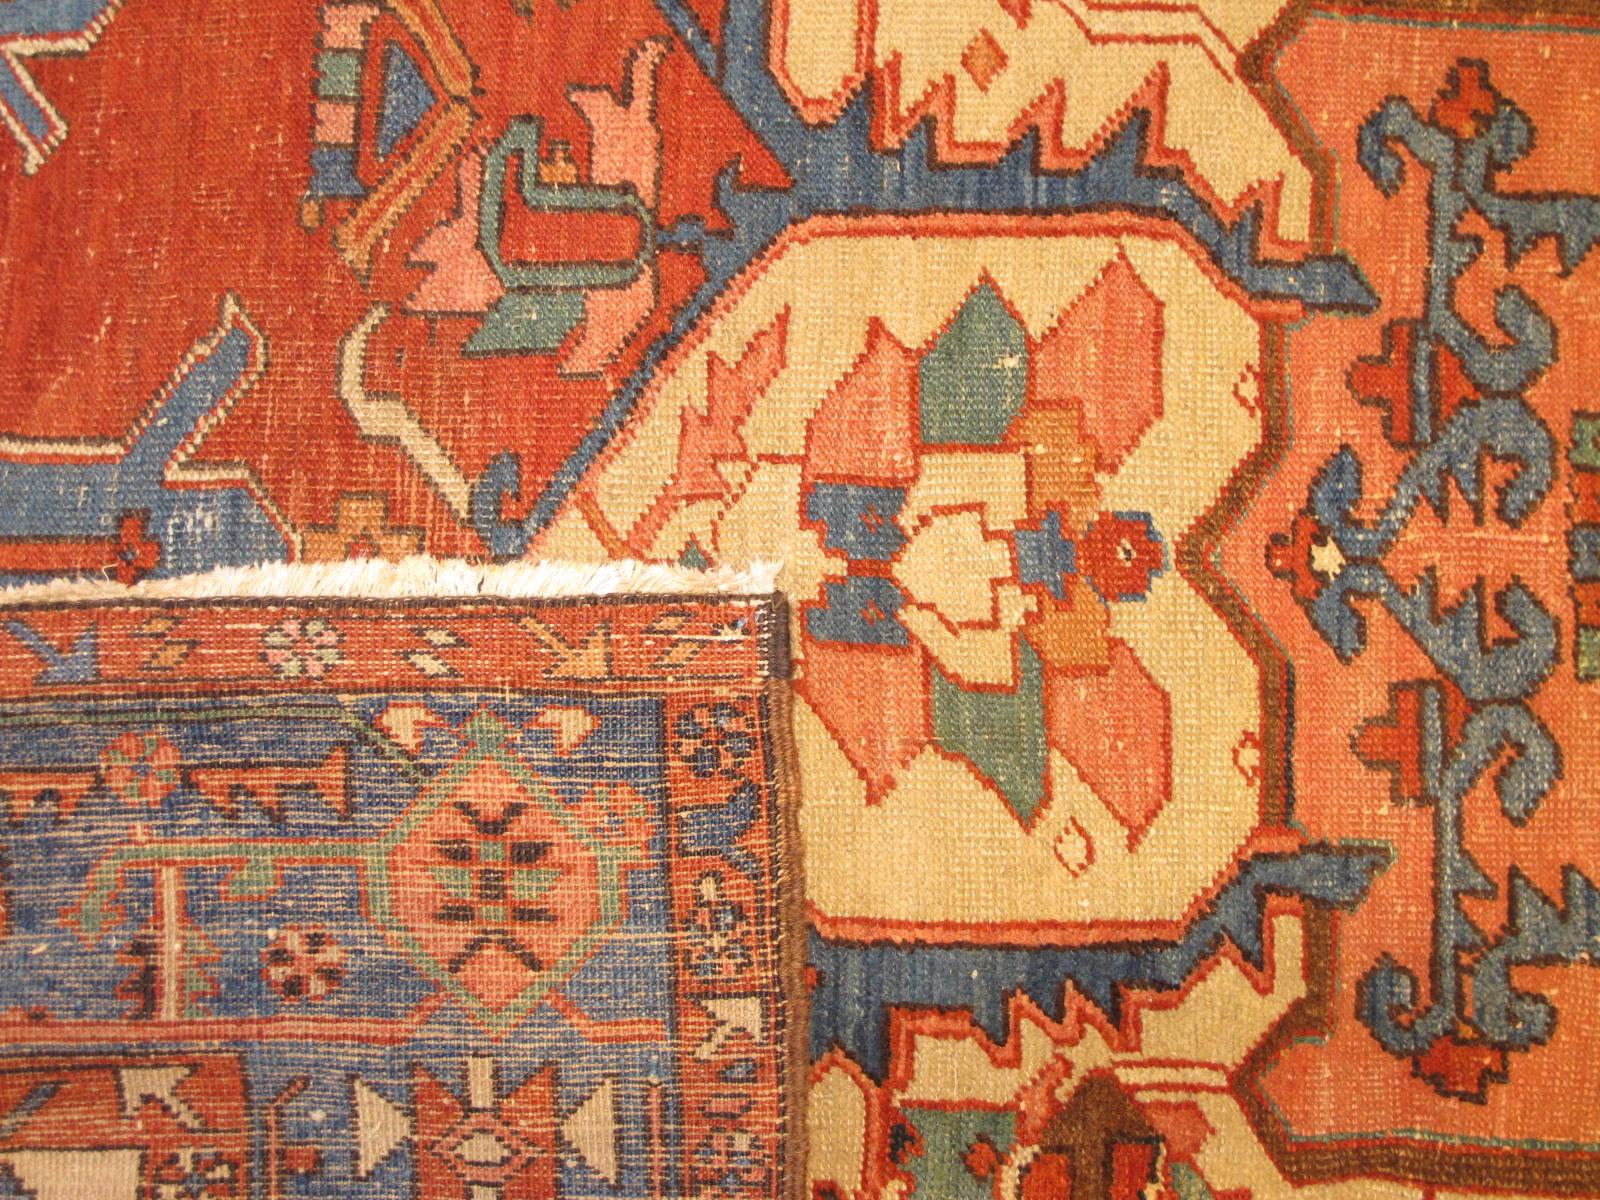 23196 antique persian serapi rug 9,10 x 12,3 (5)